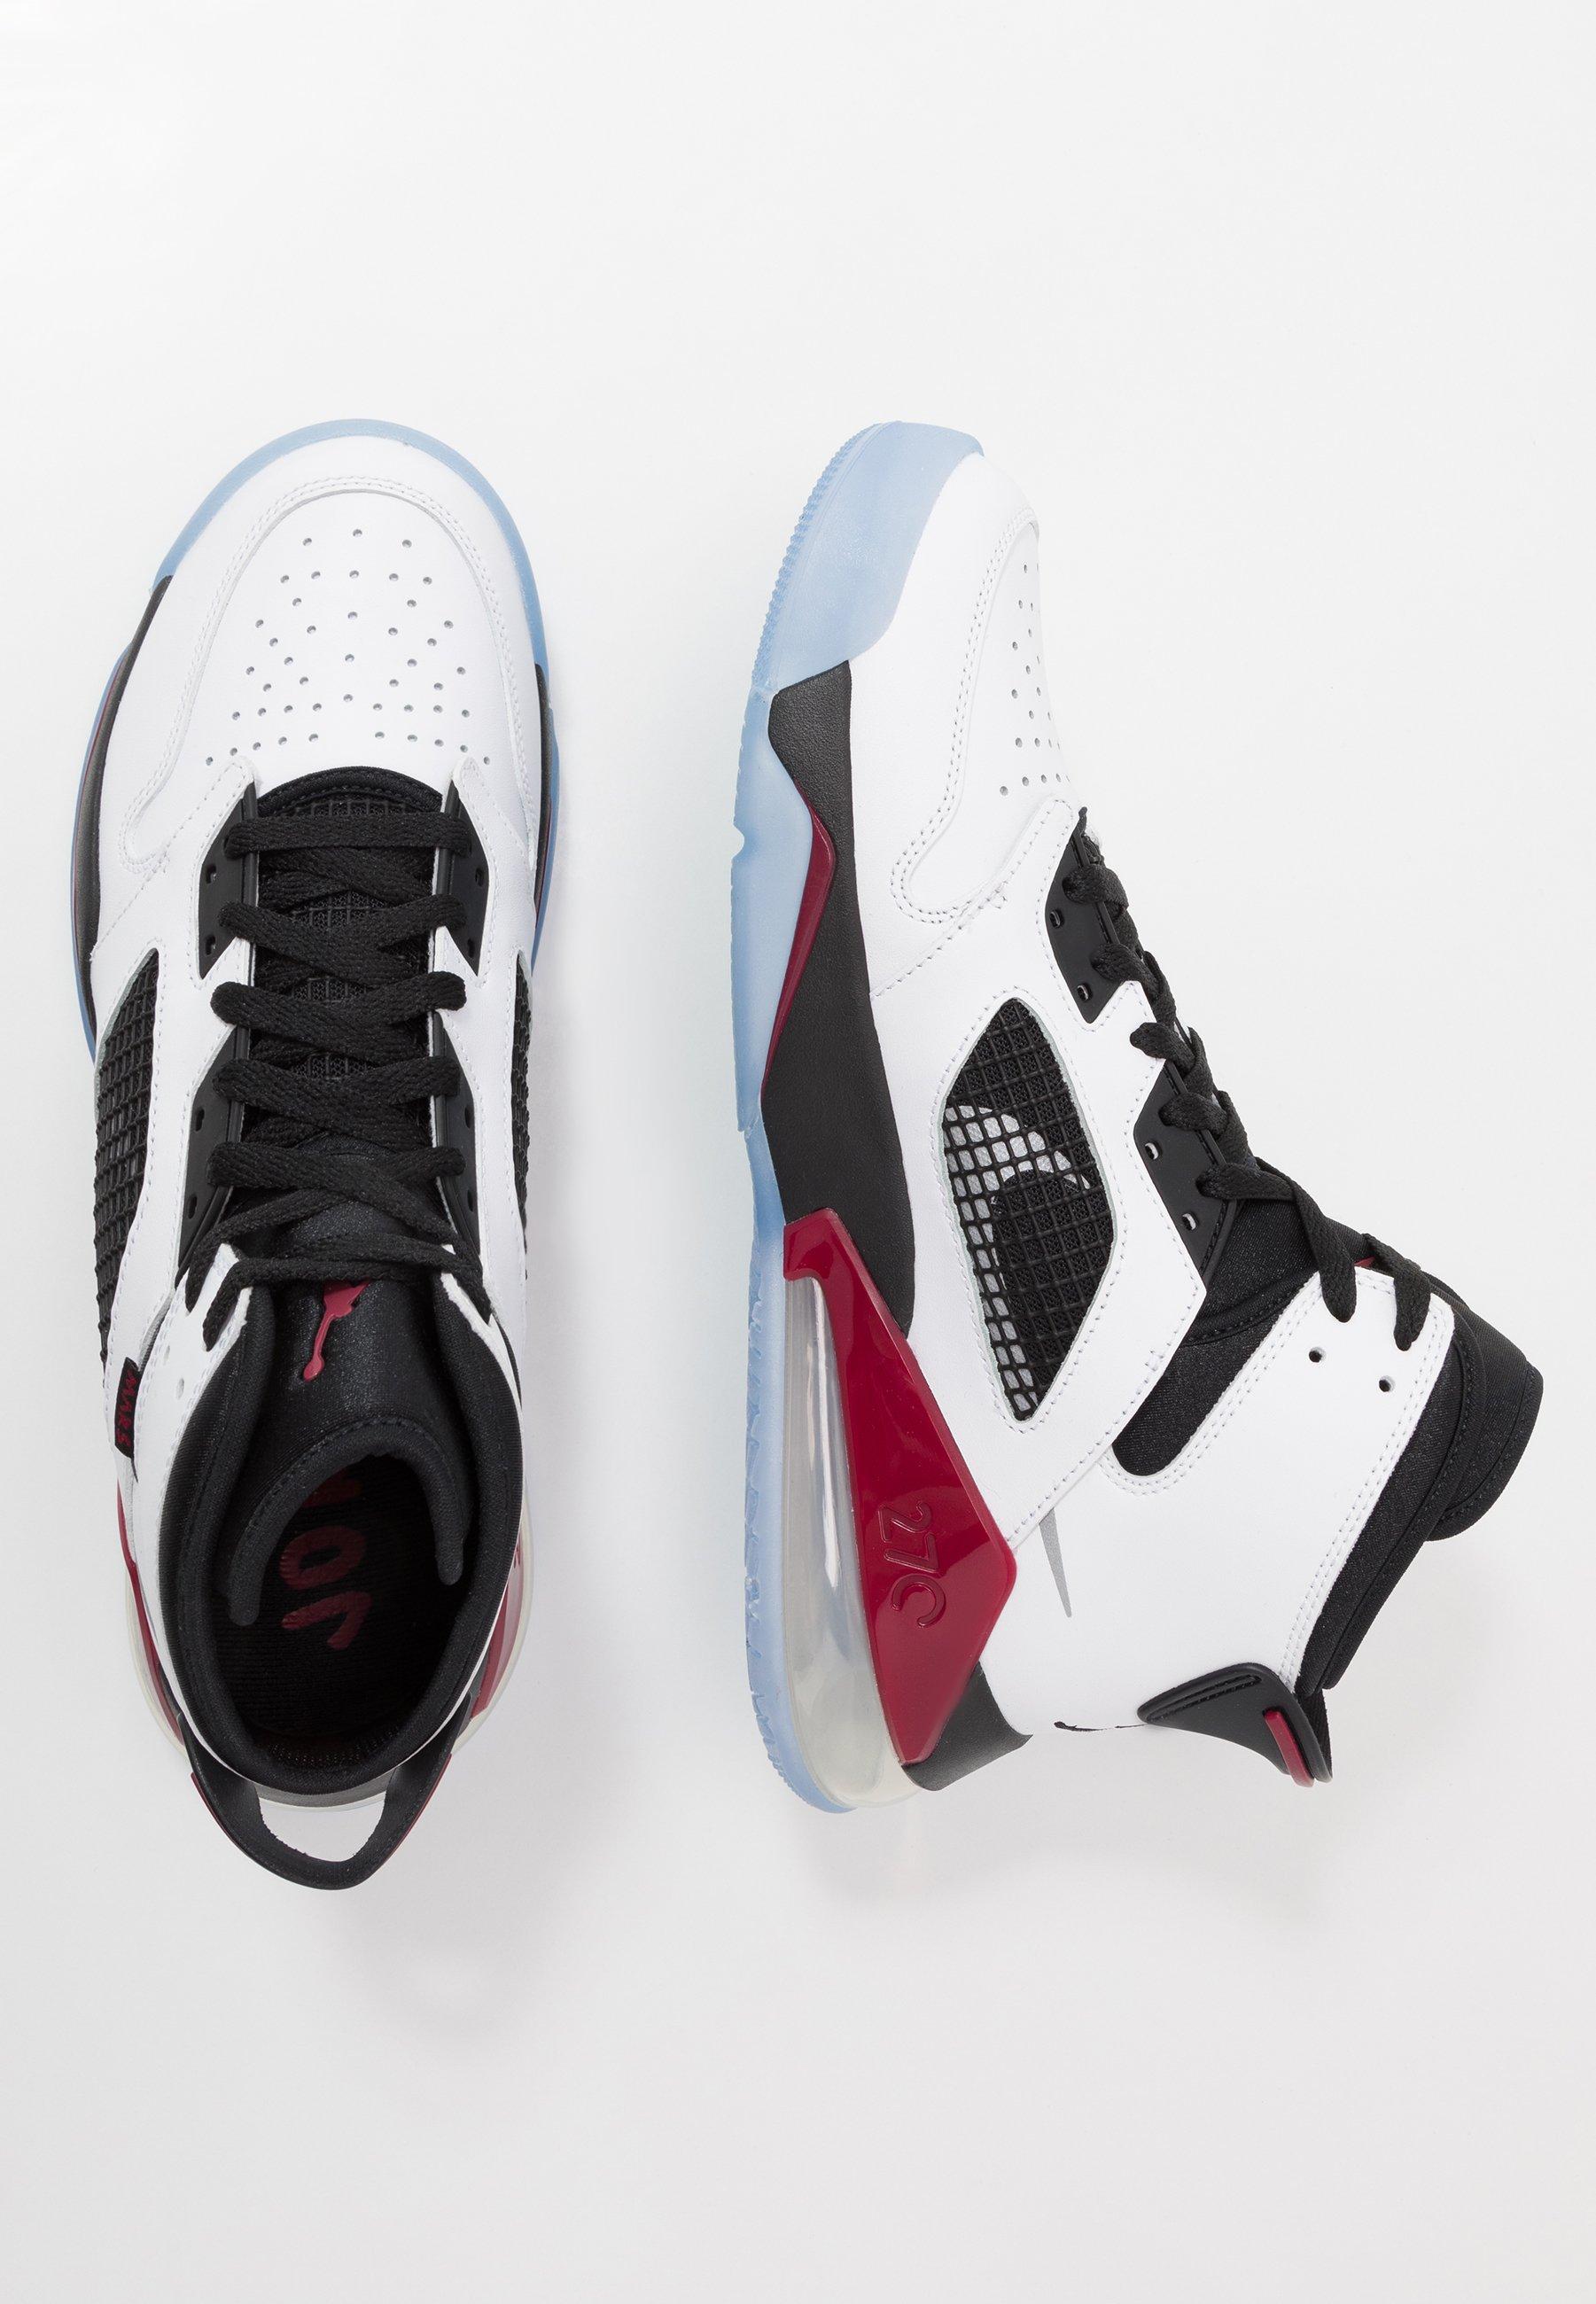 MARS 270 Höga sneakers whitereflect silvernoble redblack